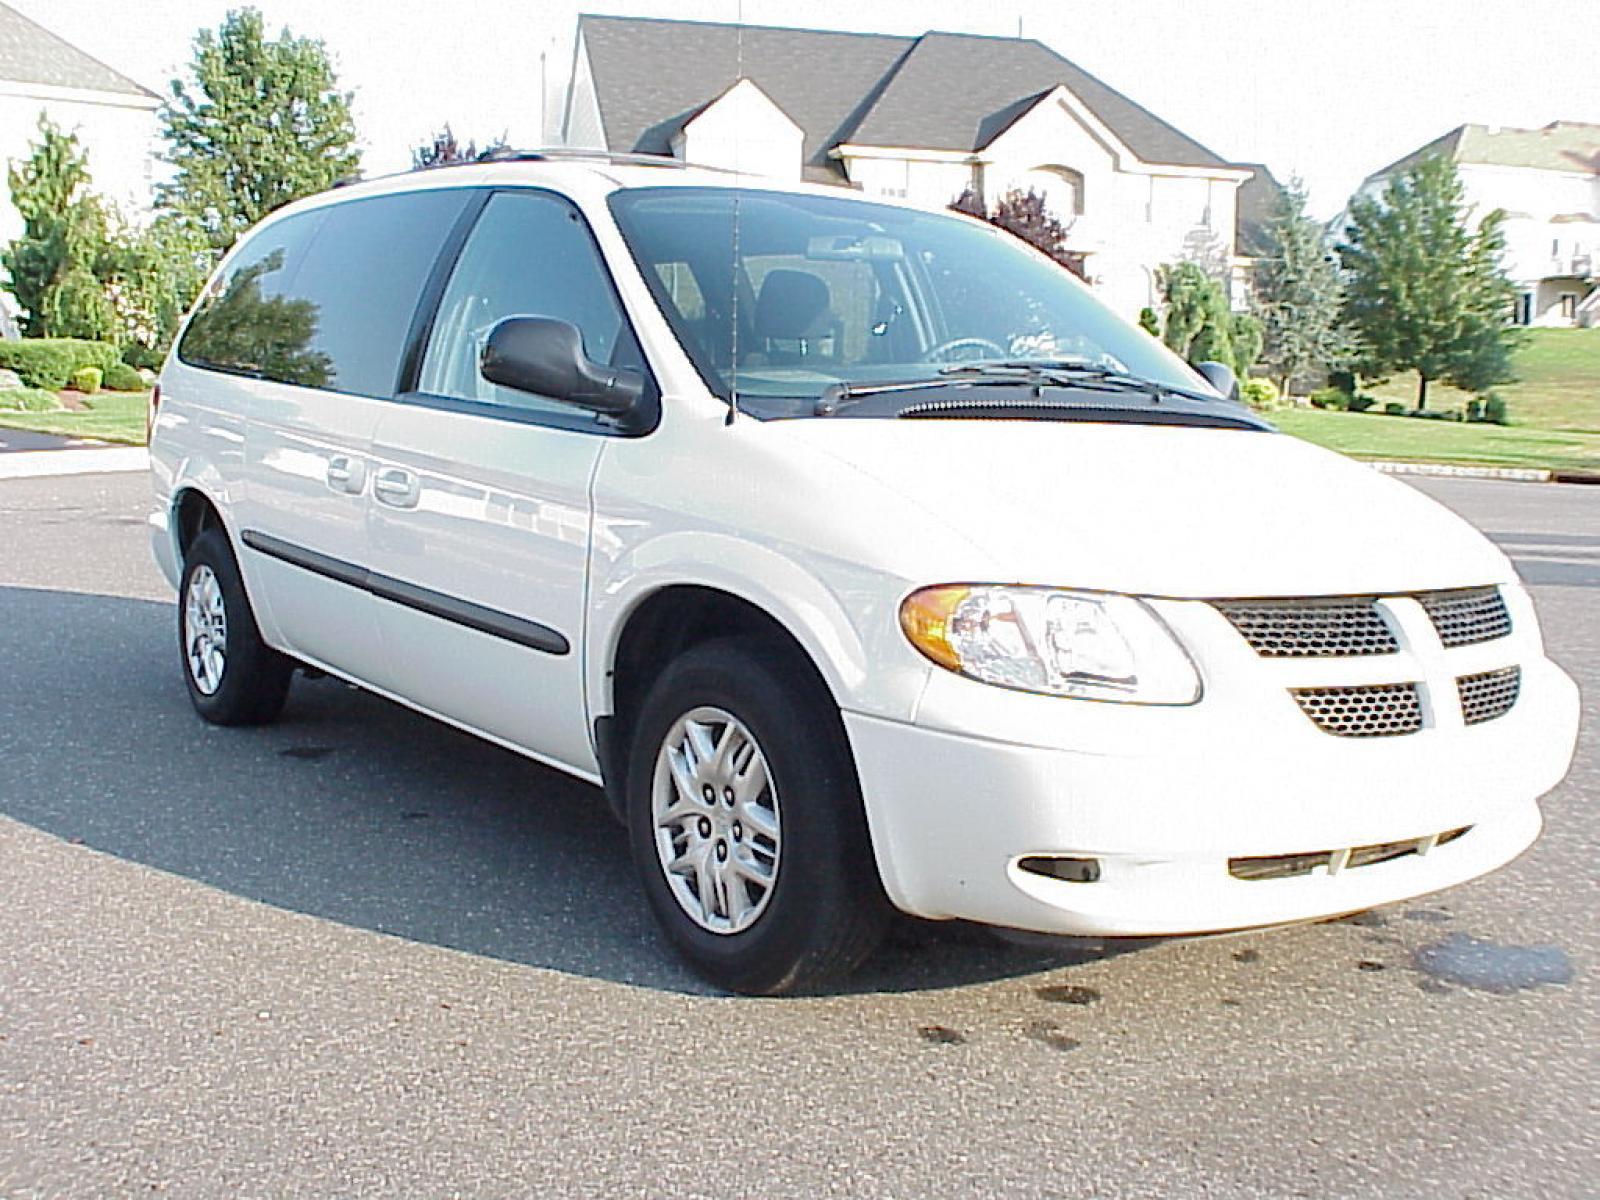 2002 Dodge Caravan #1 800 1024 1280 1600 origin